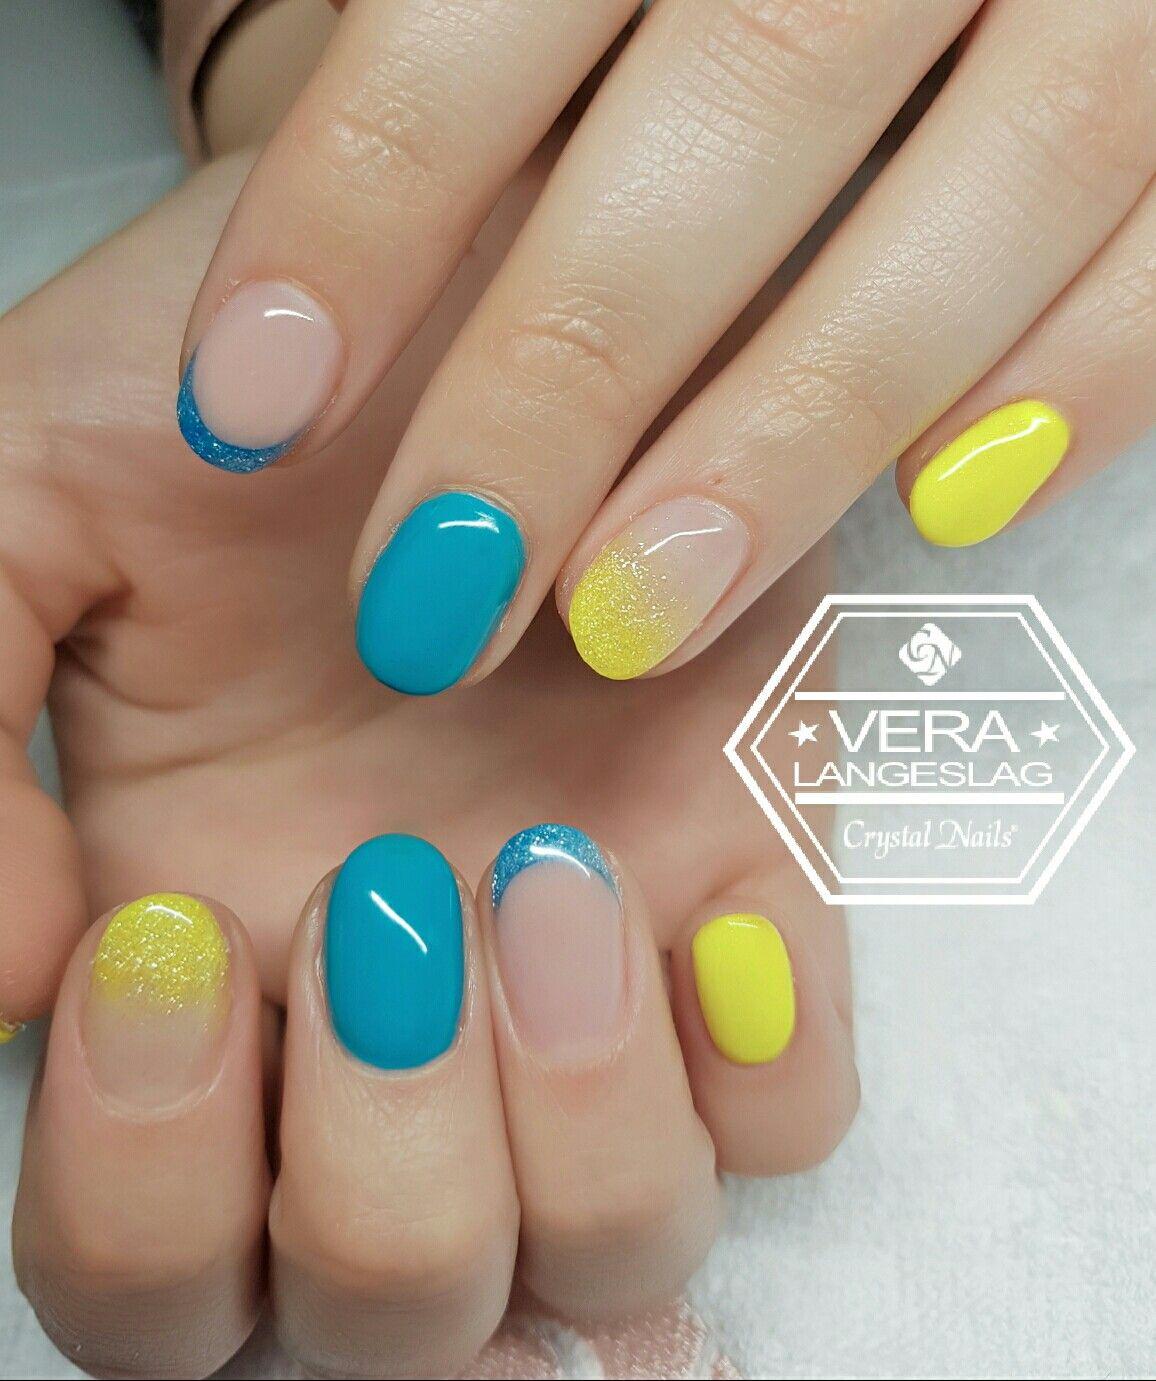 Sunny Vibe!  #crystalnails #nagelstudiopink #veralangeslag #arnhem #nailart #nails #crystalac